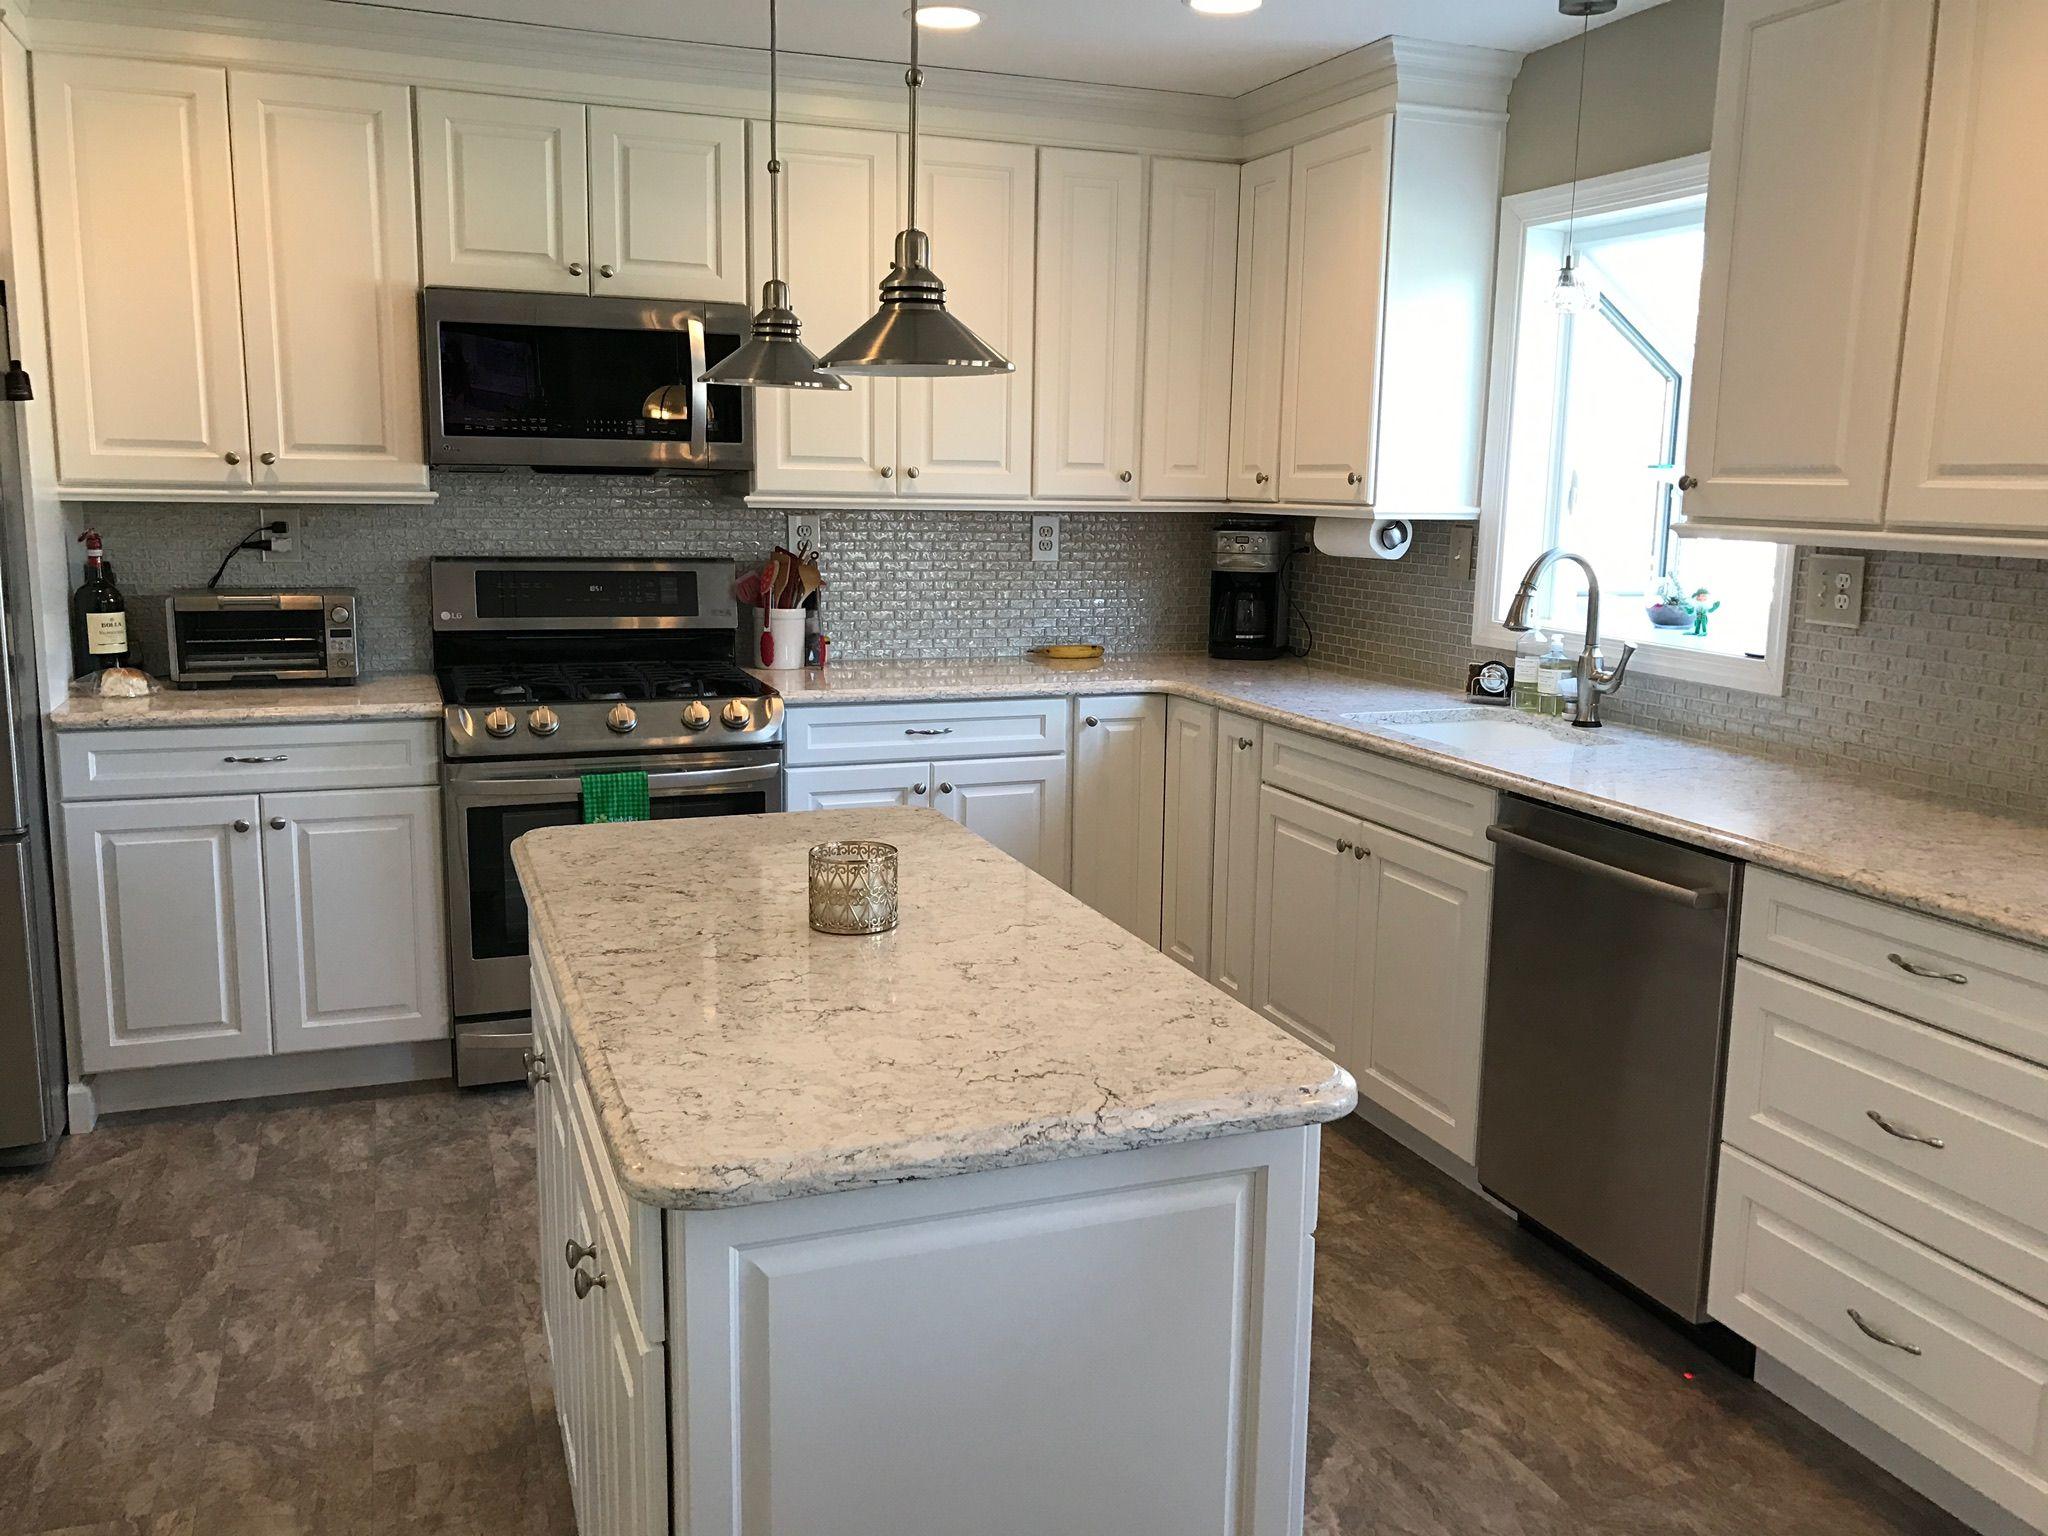 Aria Quartz Countertops Just Love Them Kitchen Worktop